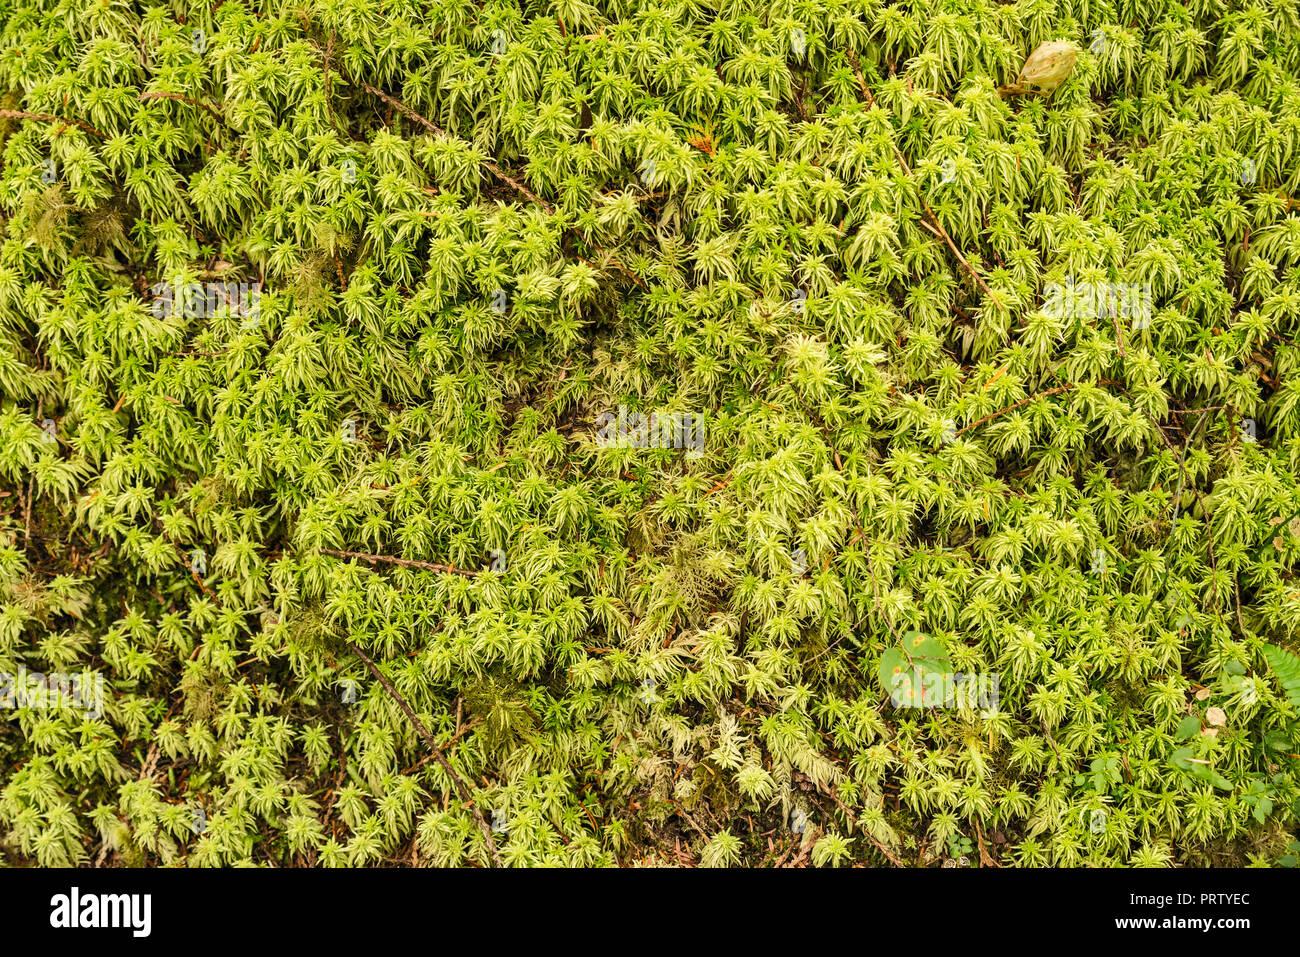 Close-up of moss, Cape Alava Trail, temperate rain forest, near Cape Alava, Pacific Coast, Olympic National Park, Washington state, USA Stock Photo